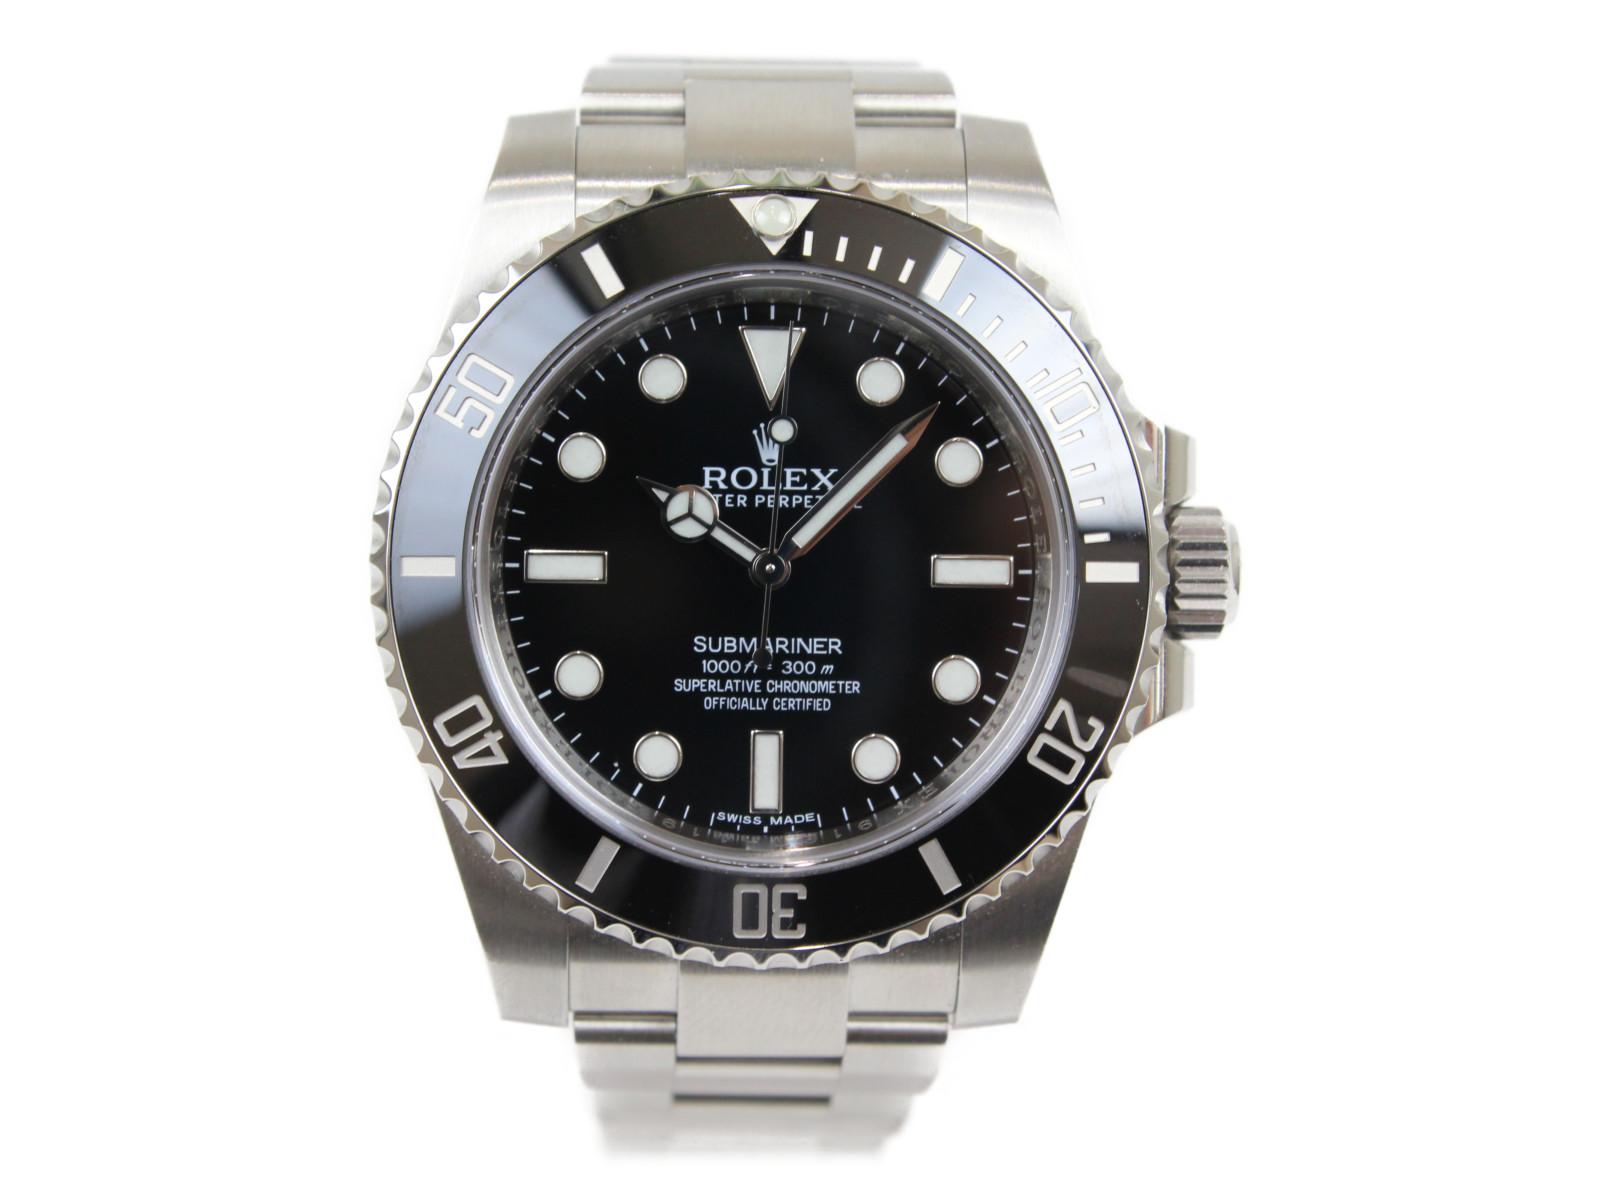 ROLEX ロレックス サブマリーナーノンデイト 114060 ランダム 2013年 自動巻き SS ステンレススチール ブラック メンズ 腕時計【中古】